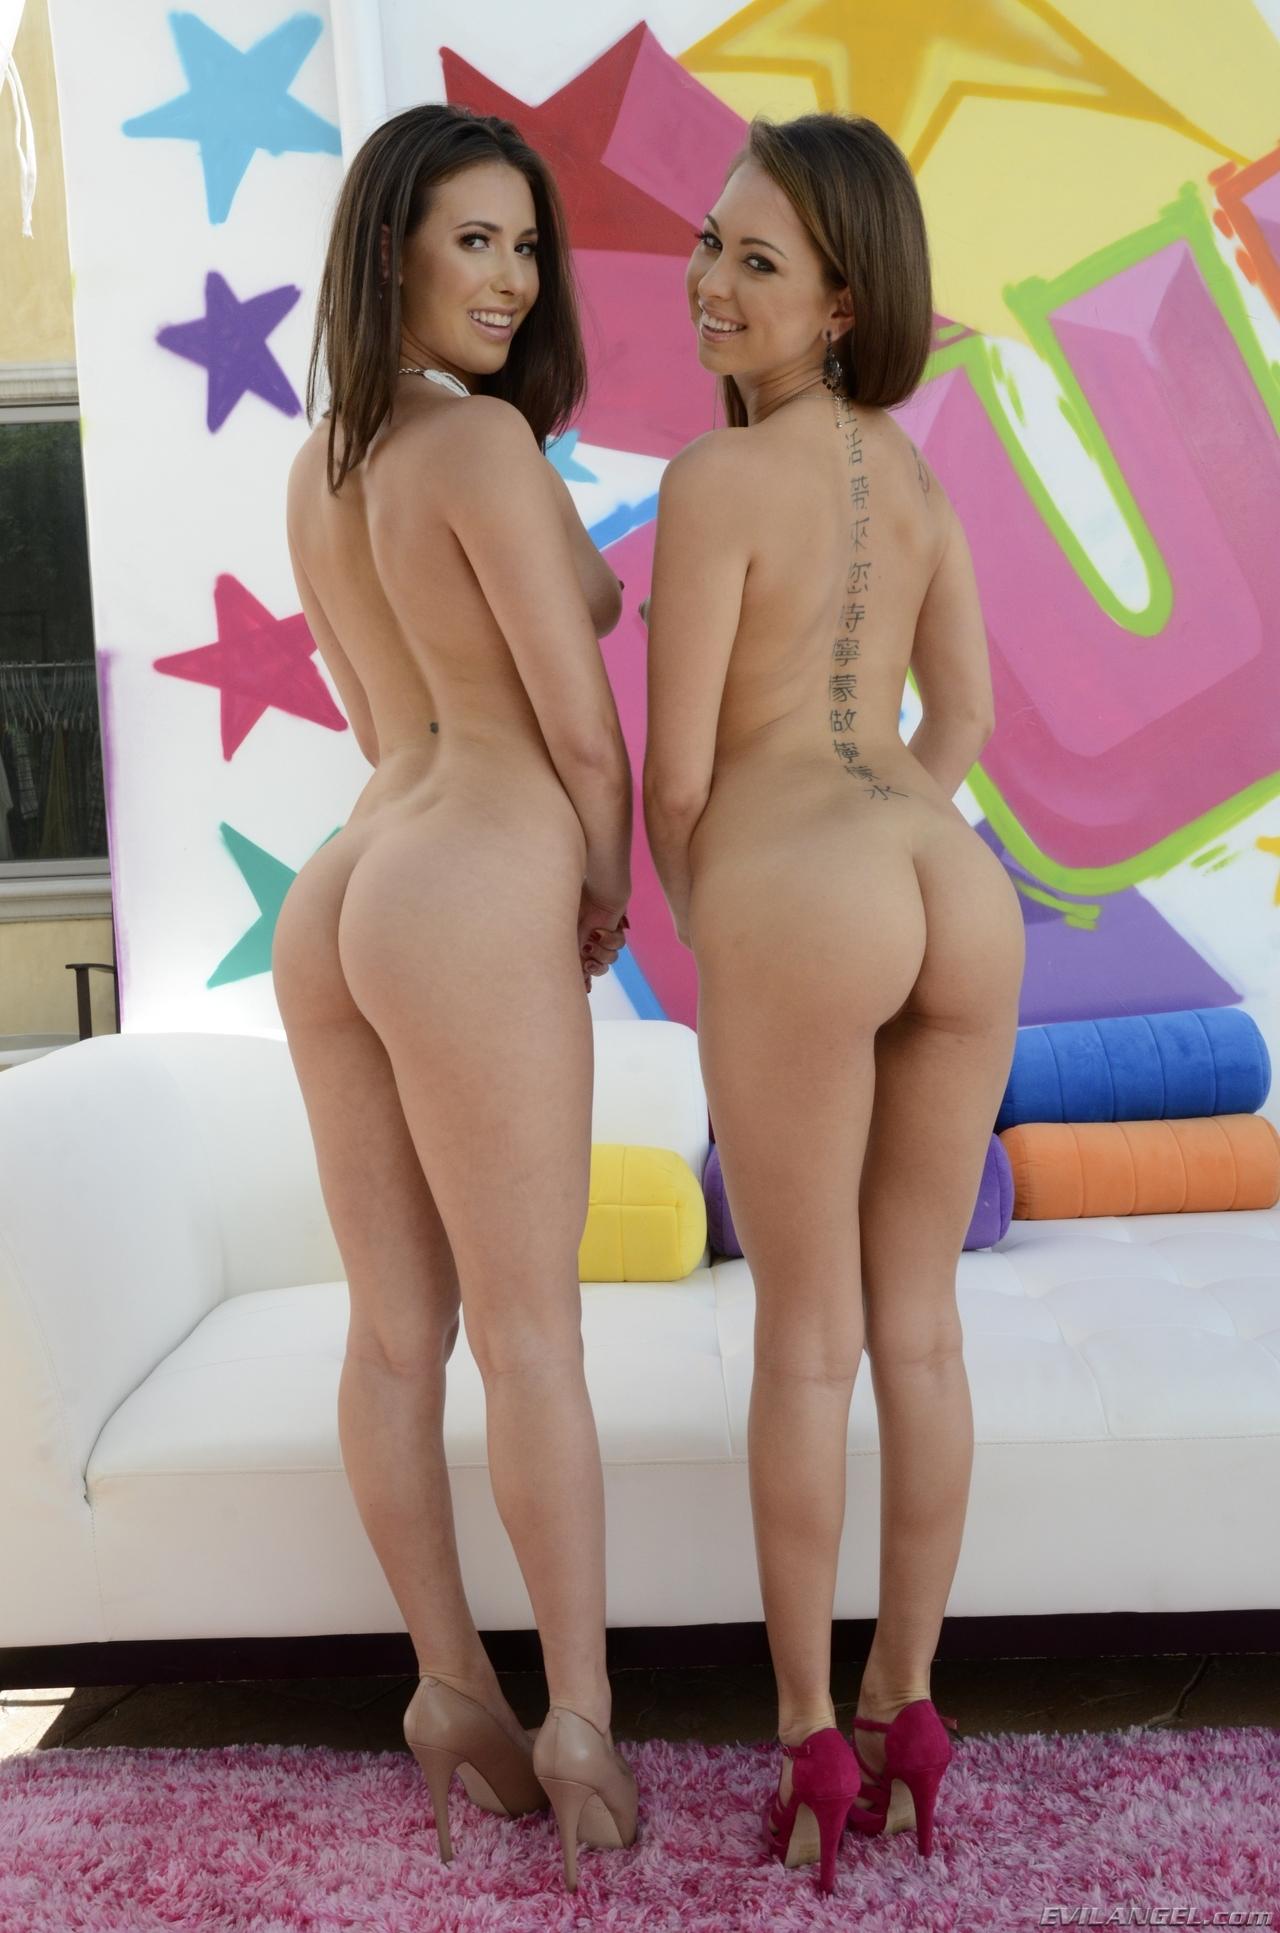 girls-naked-high-heels-pussy-mix-vol2-30